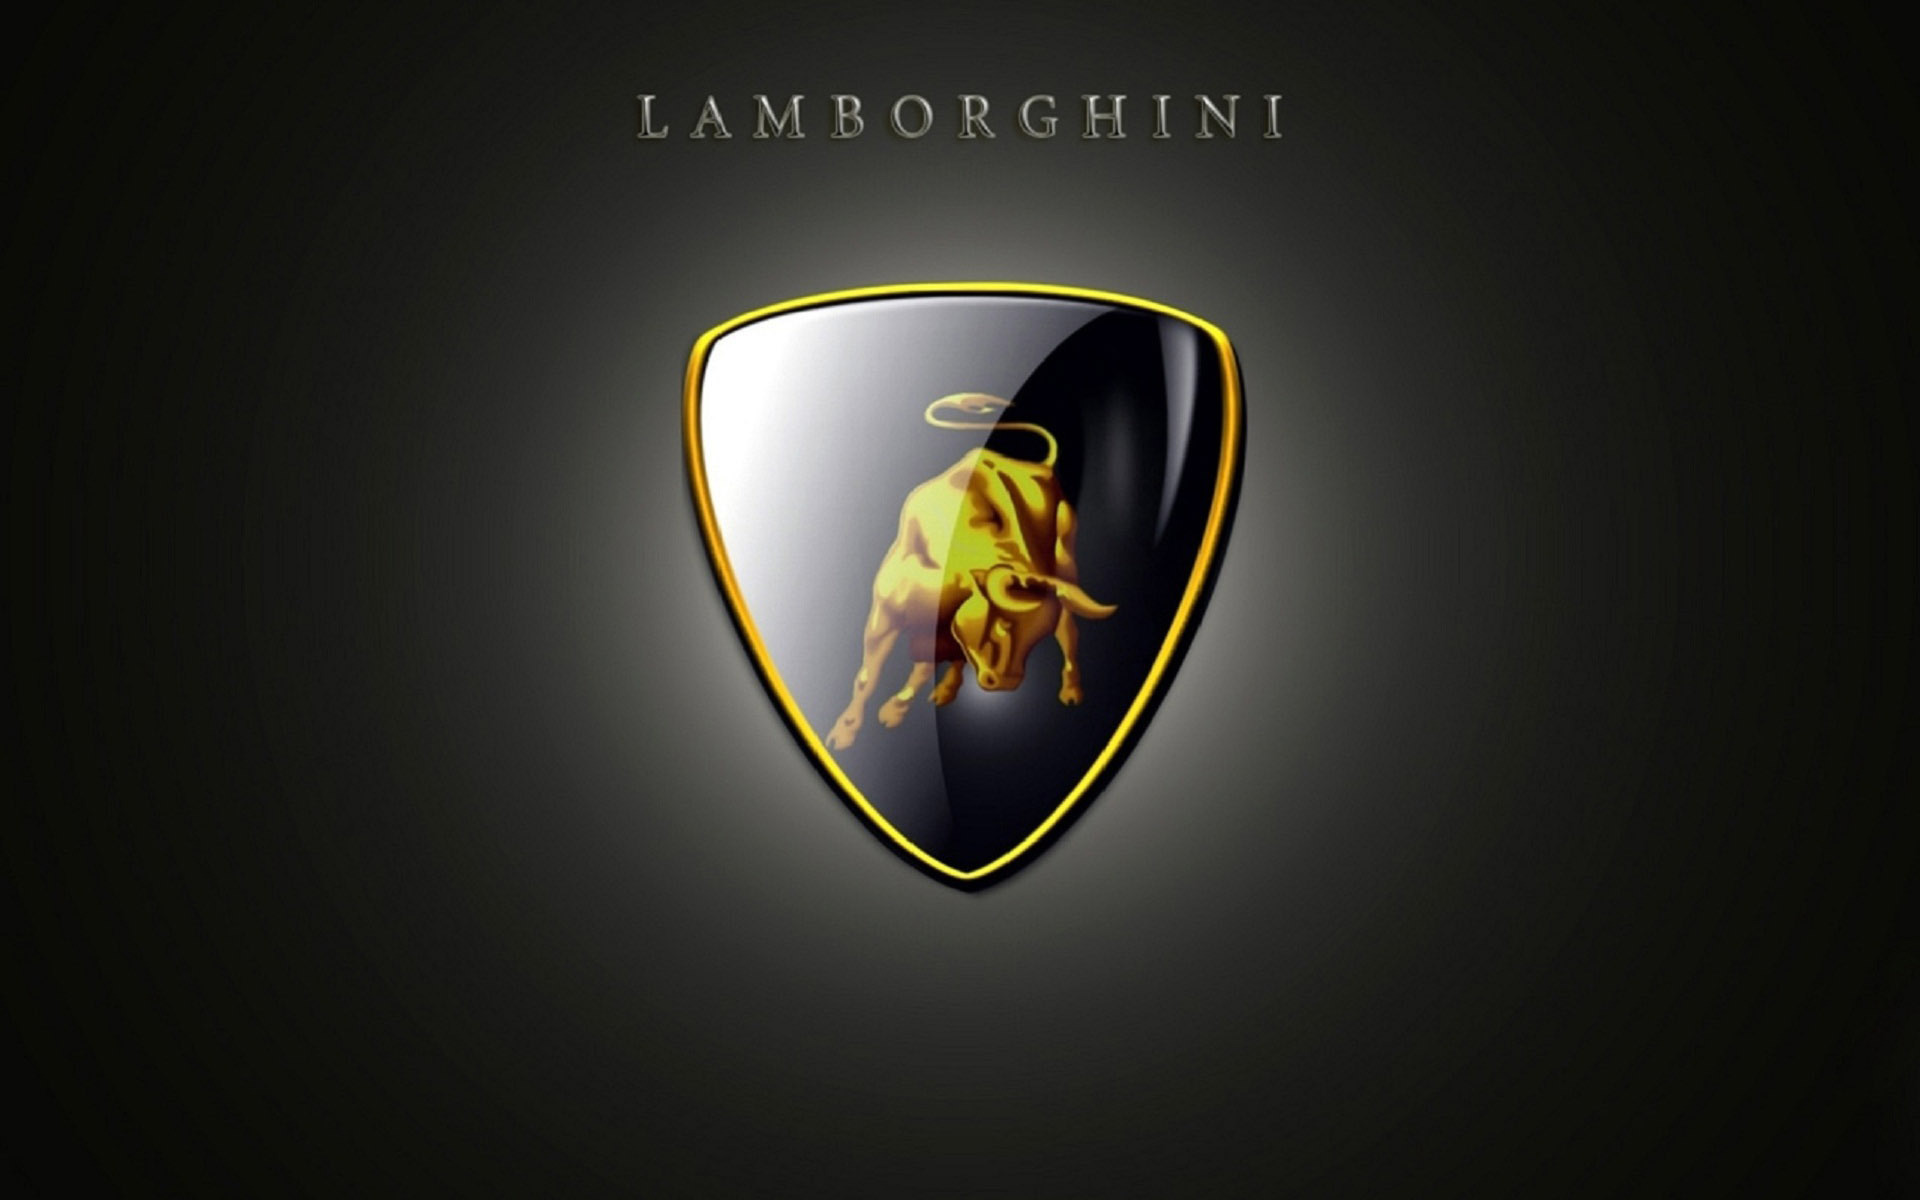 Lamborghini Logo wallpapers 1920x1200